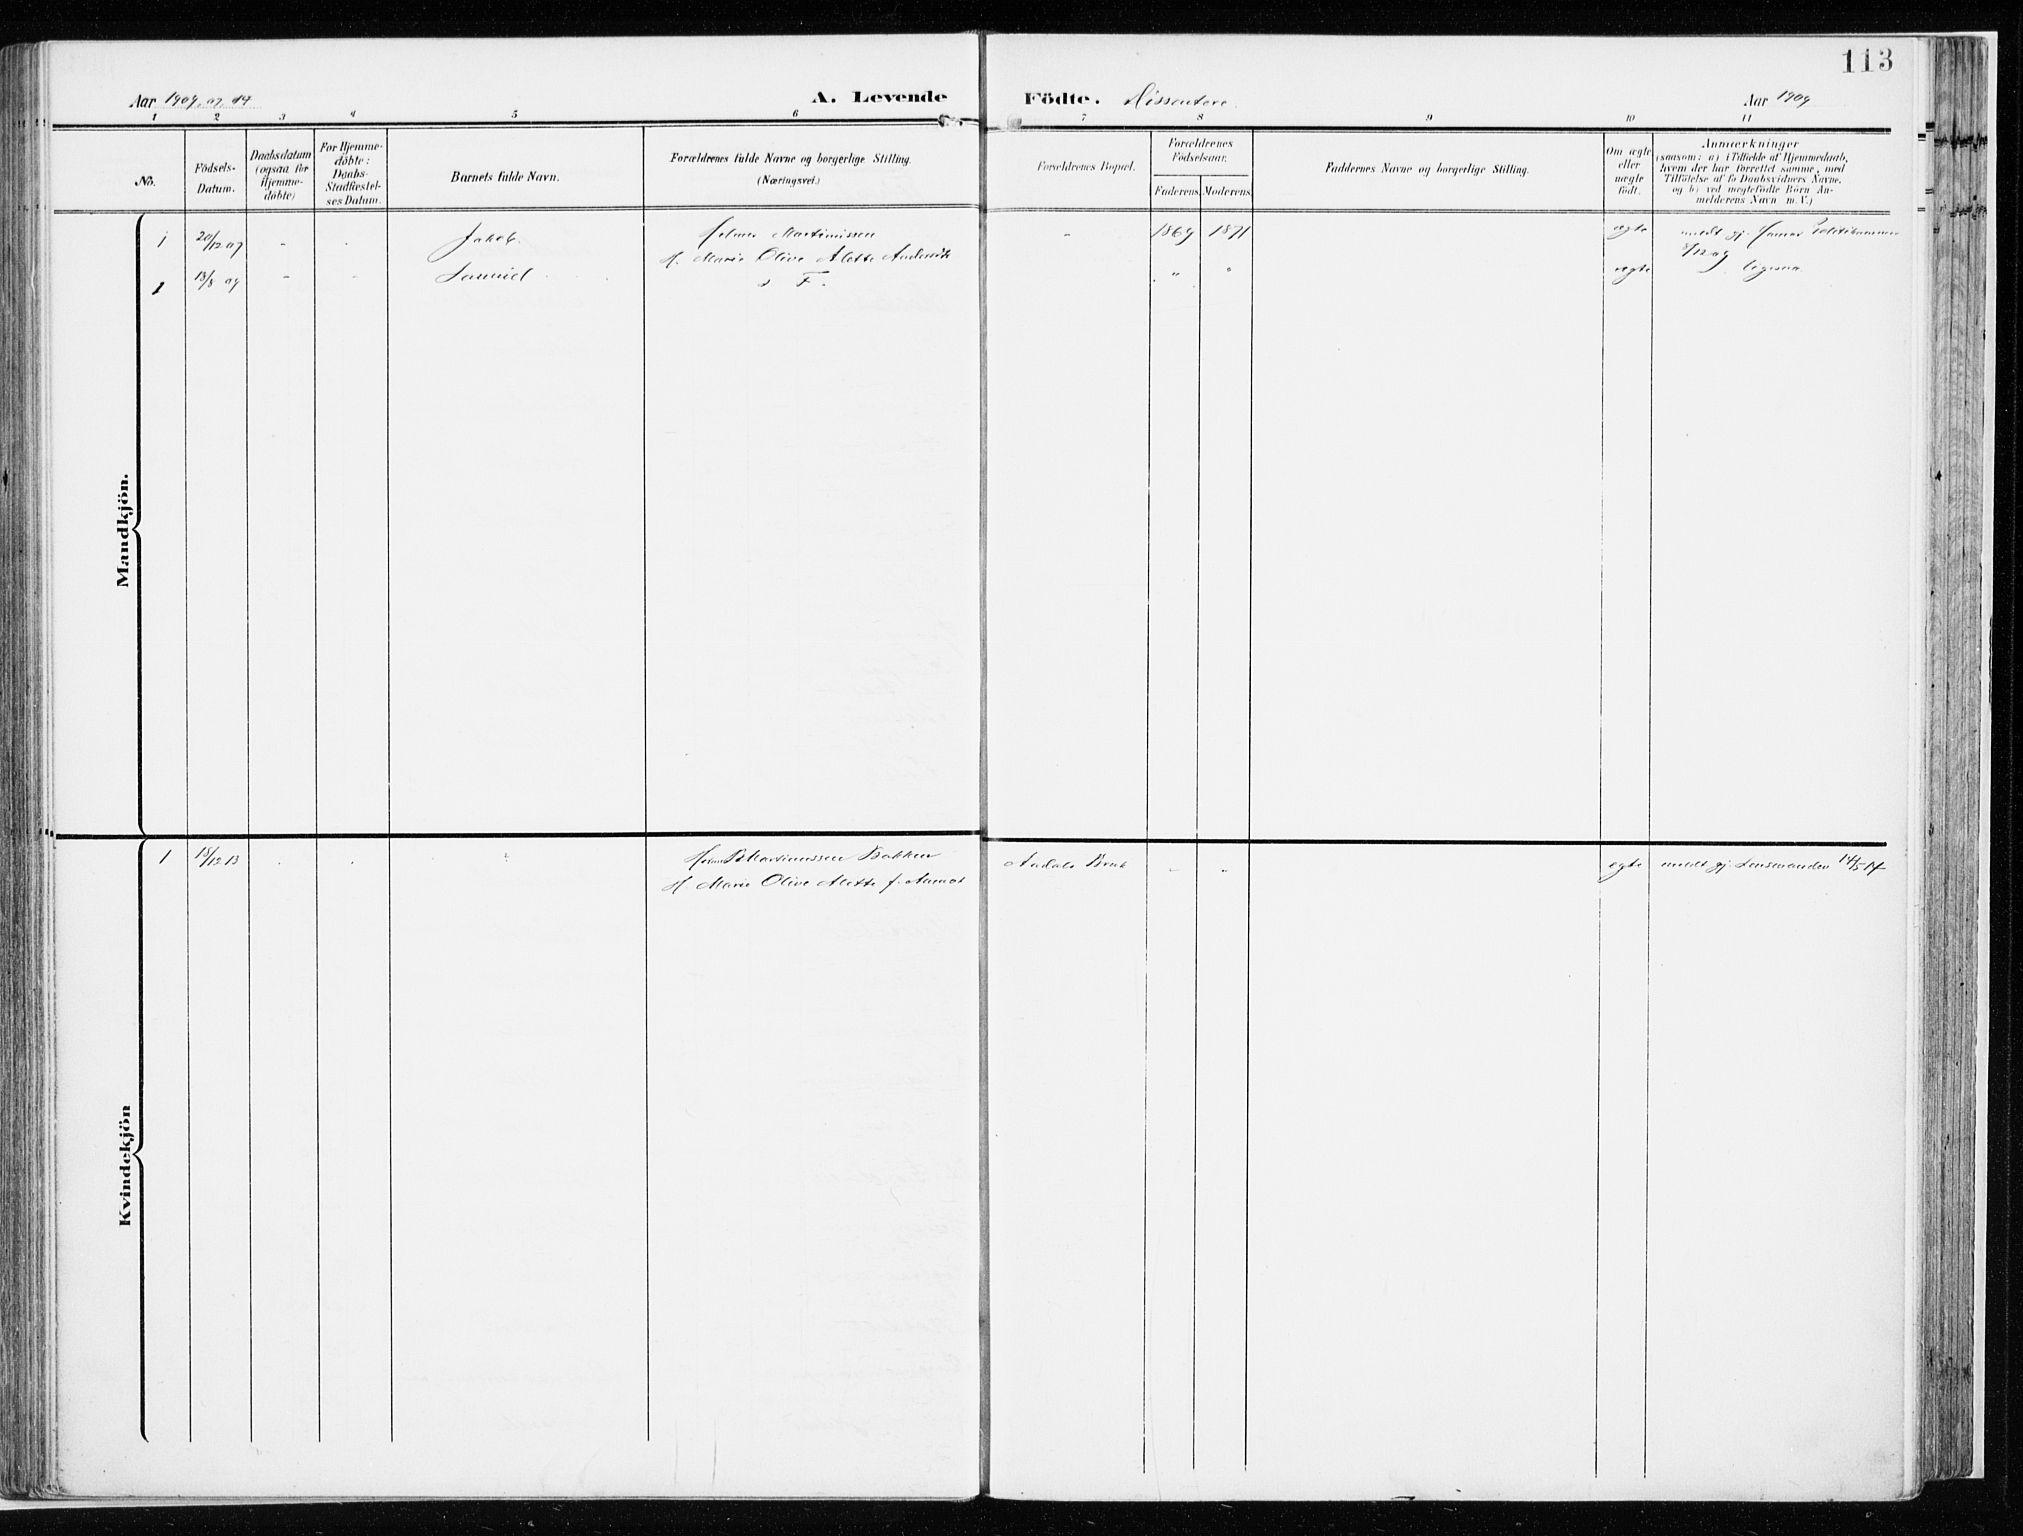 SAH, Løten prestekontor, K/Ka/L0011: Ministerialbok nr. 11, 1908-1917, s. 113